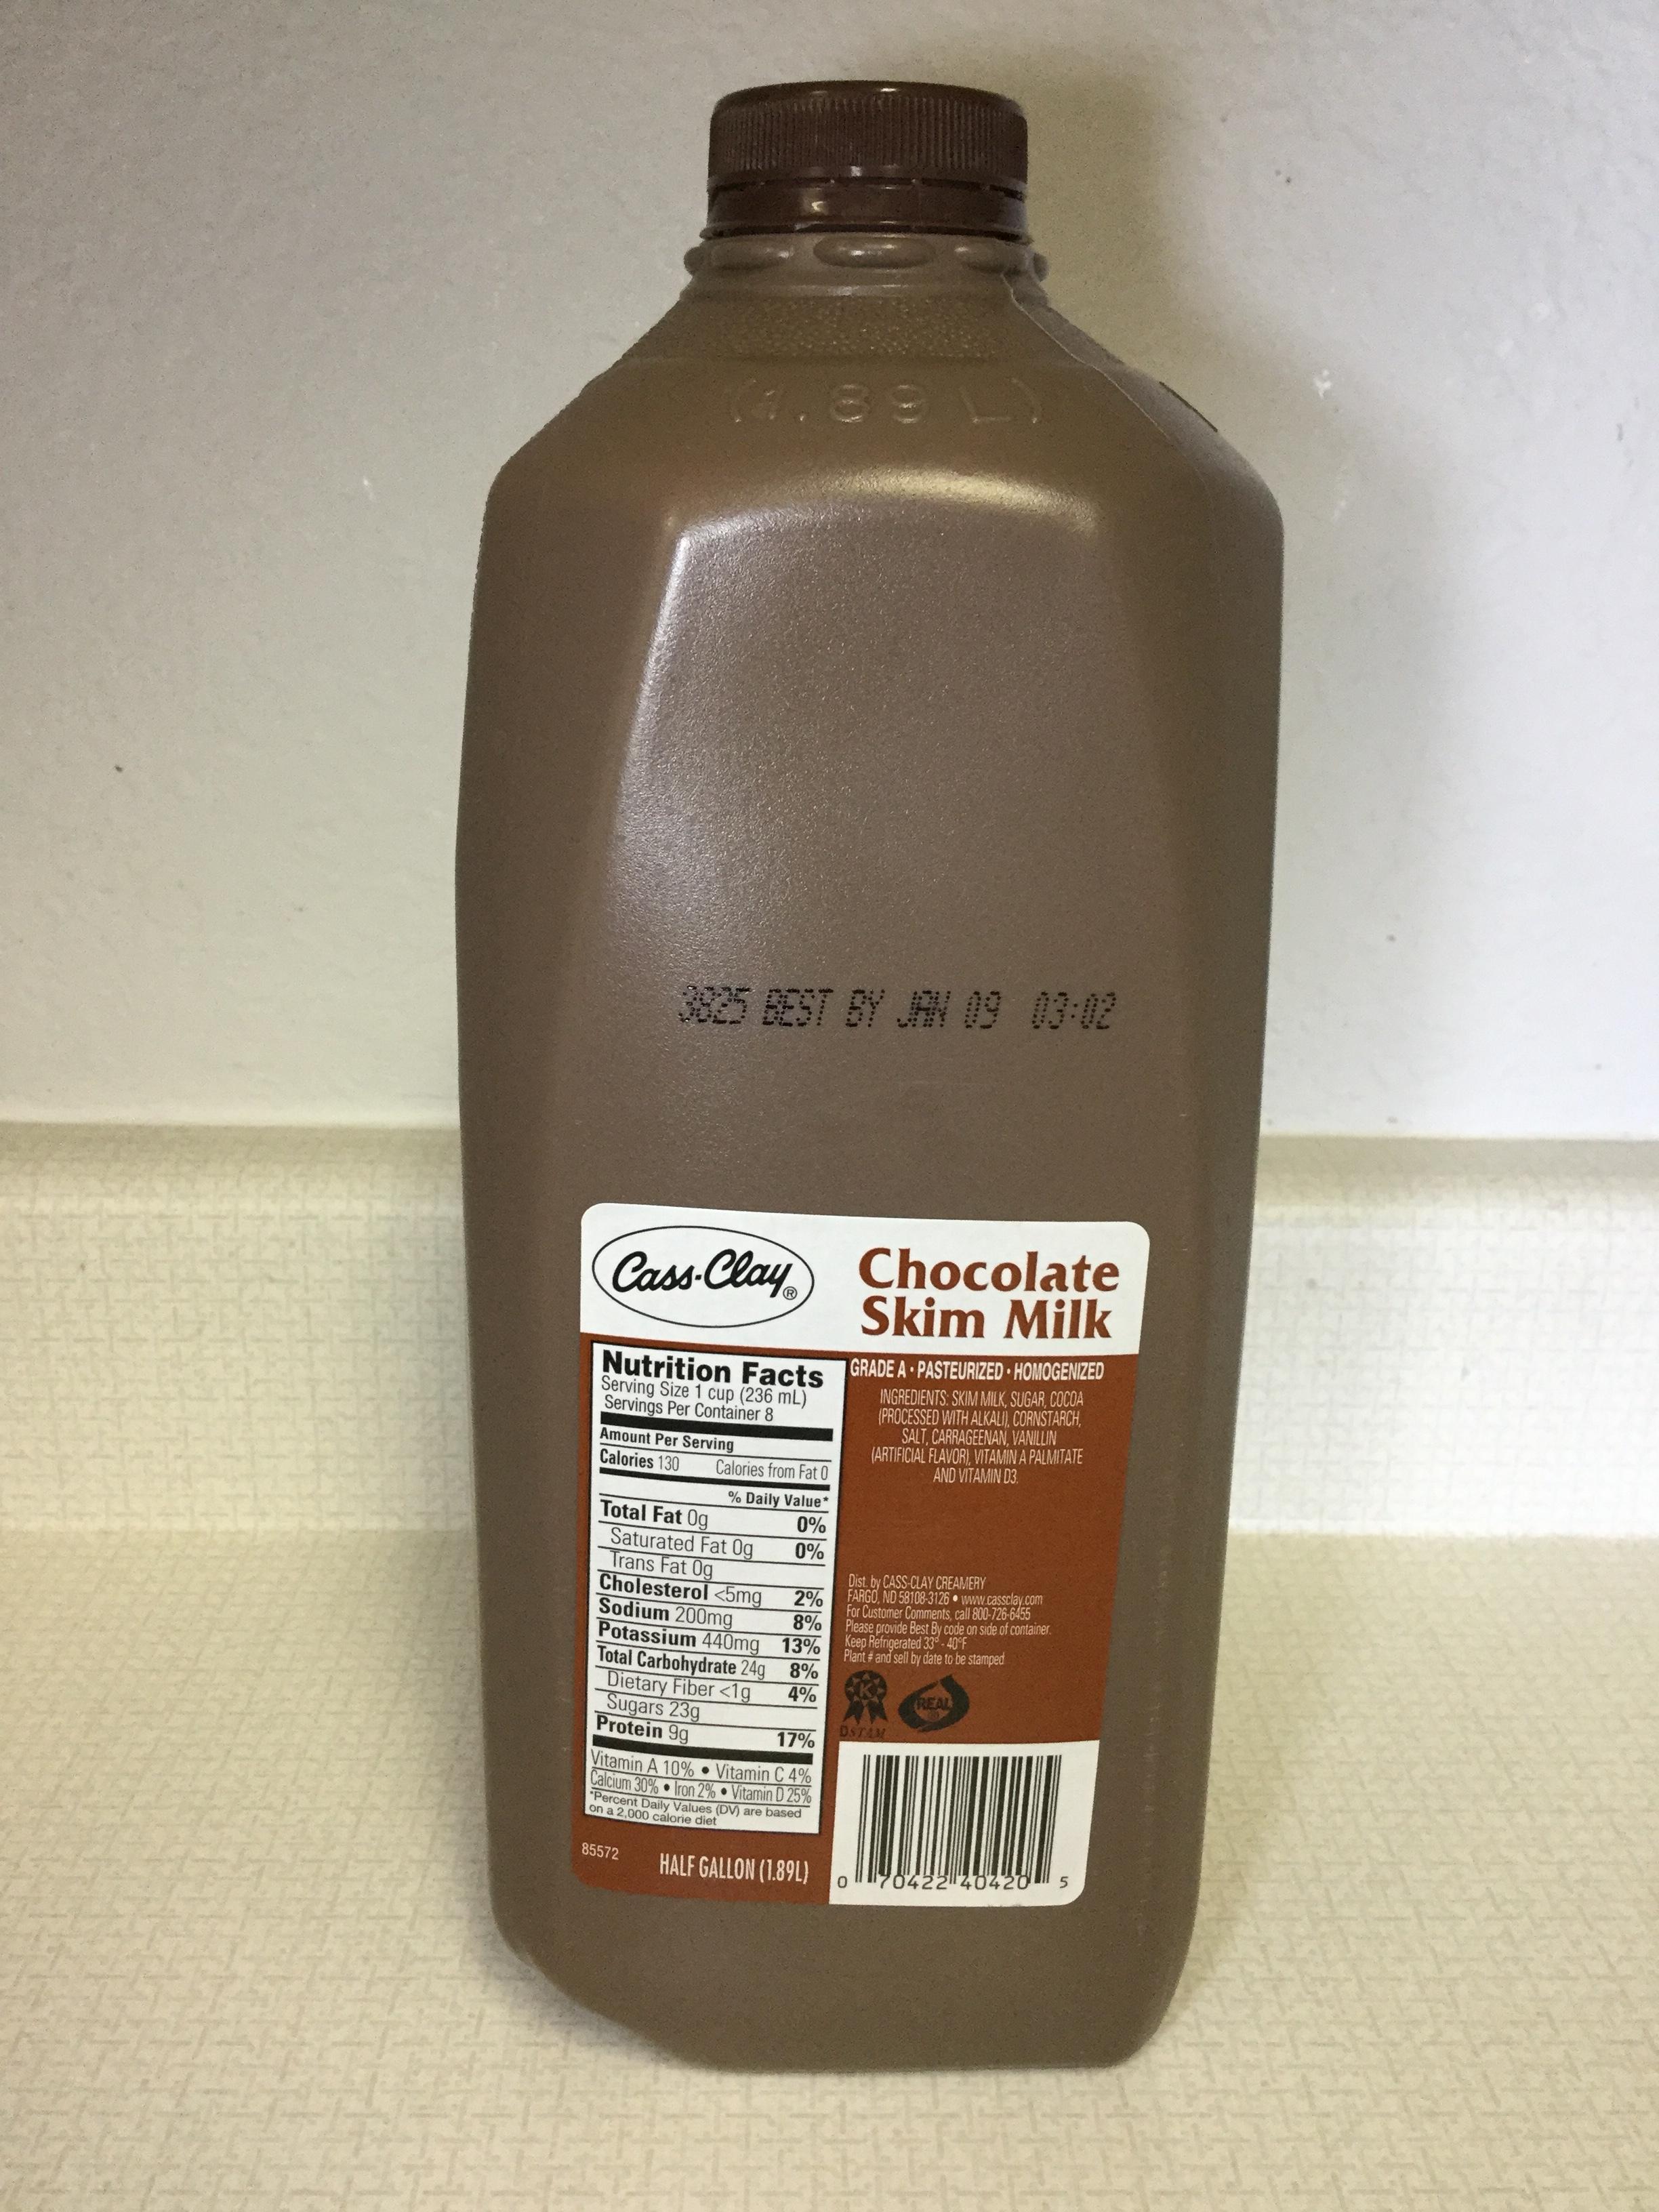 Cass-Clay Fat Free Chocolate Skim Milk Side 1